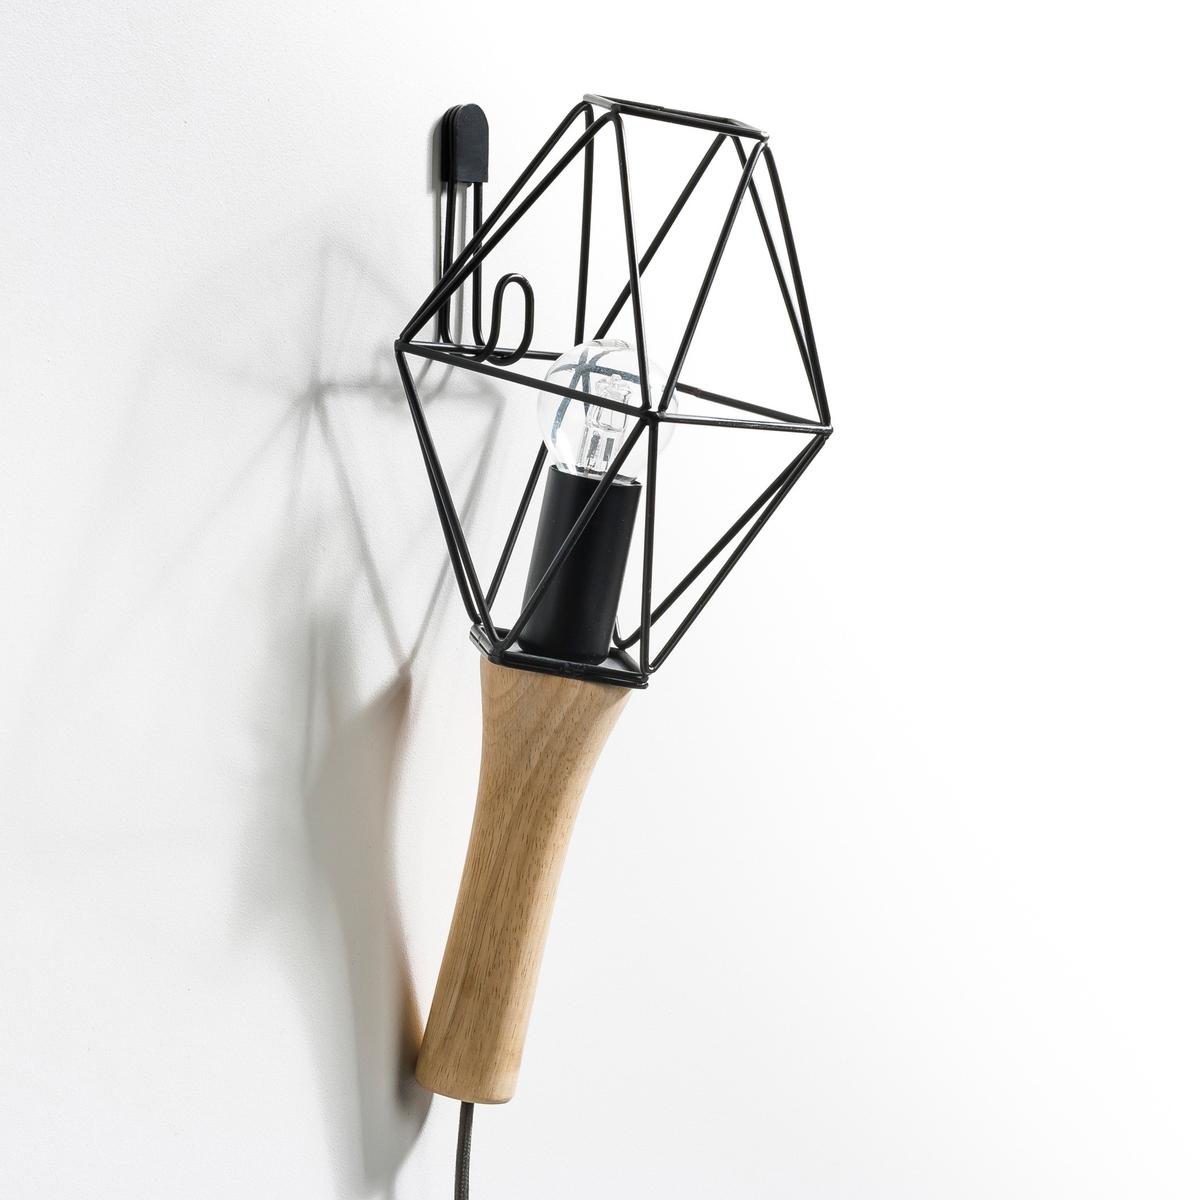 Лампа переносная, Nomade от La Redoute